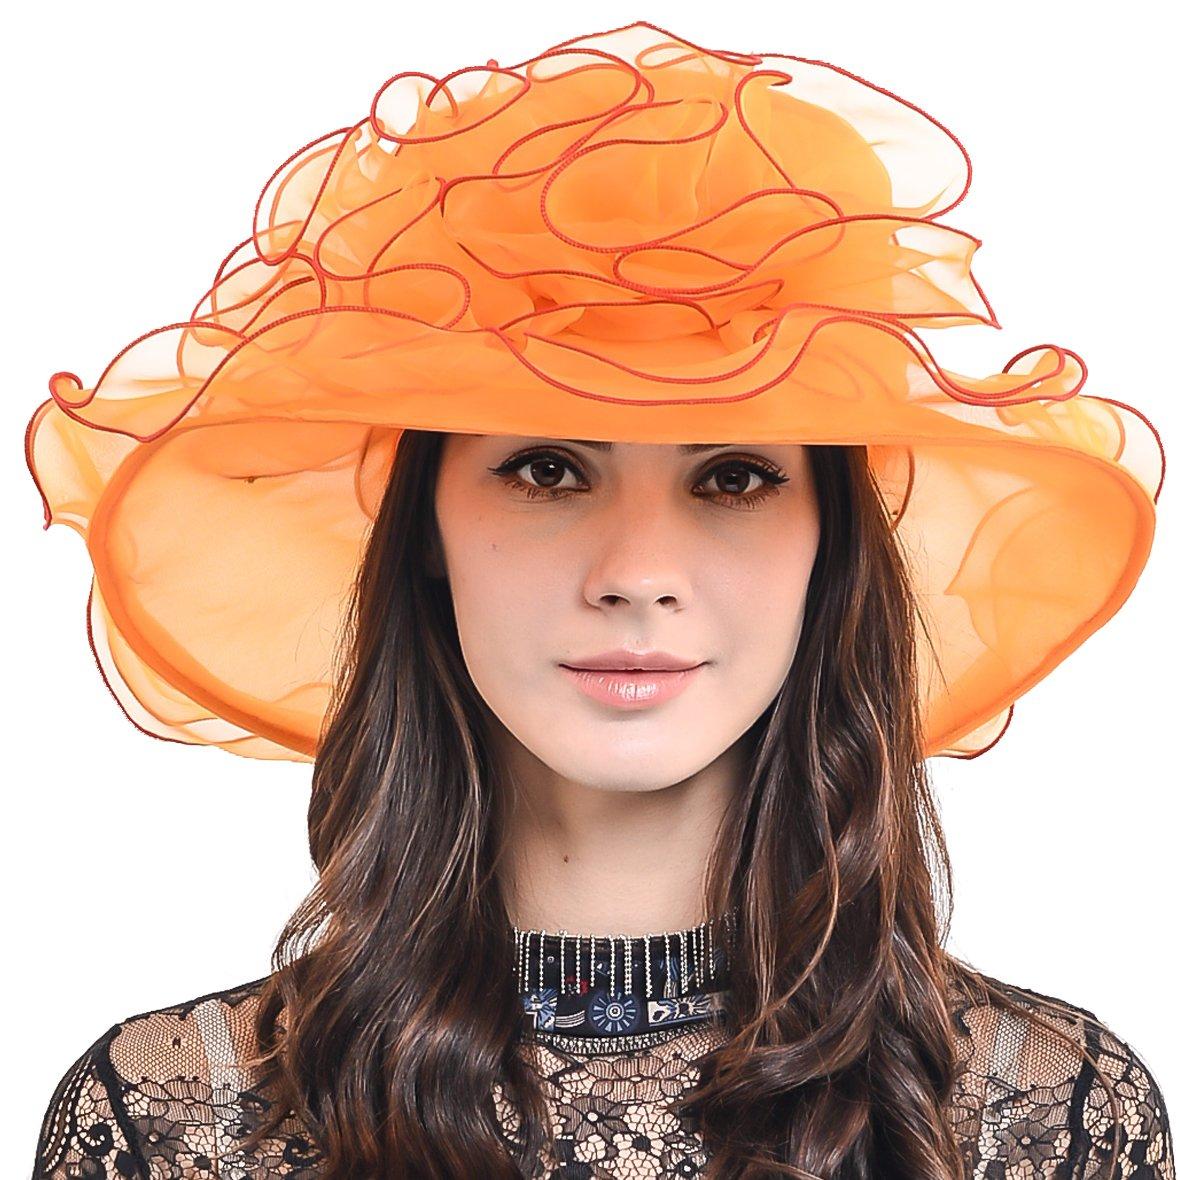 Womens Organza Church Dress Derby Wedding Floral Tea Party Hat S09 (Orange) by HISSHE (Image #1)